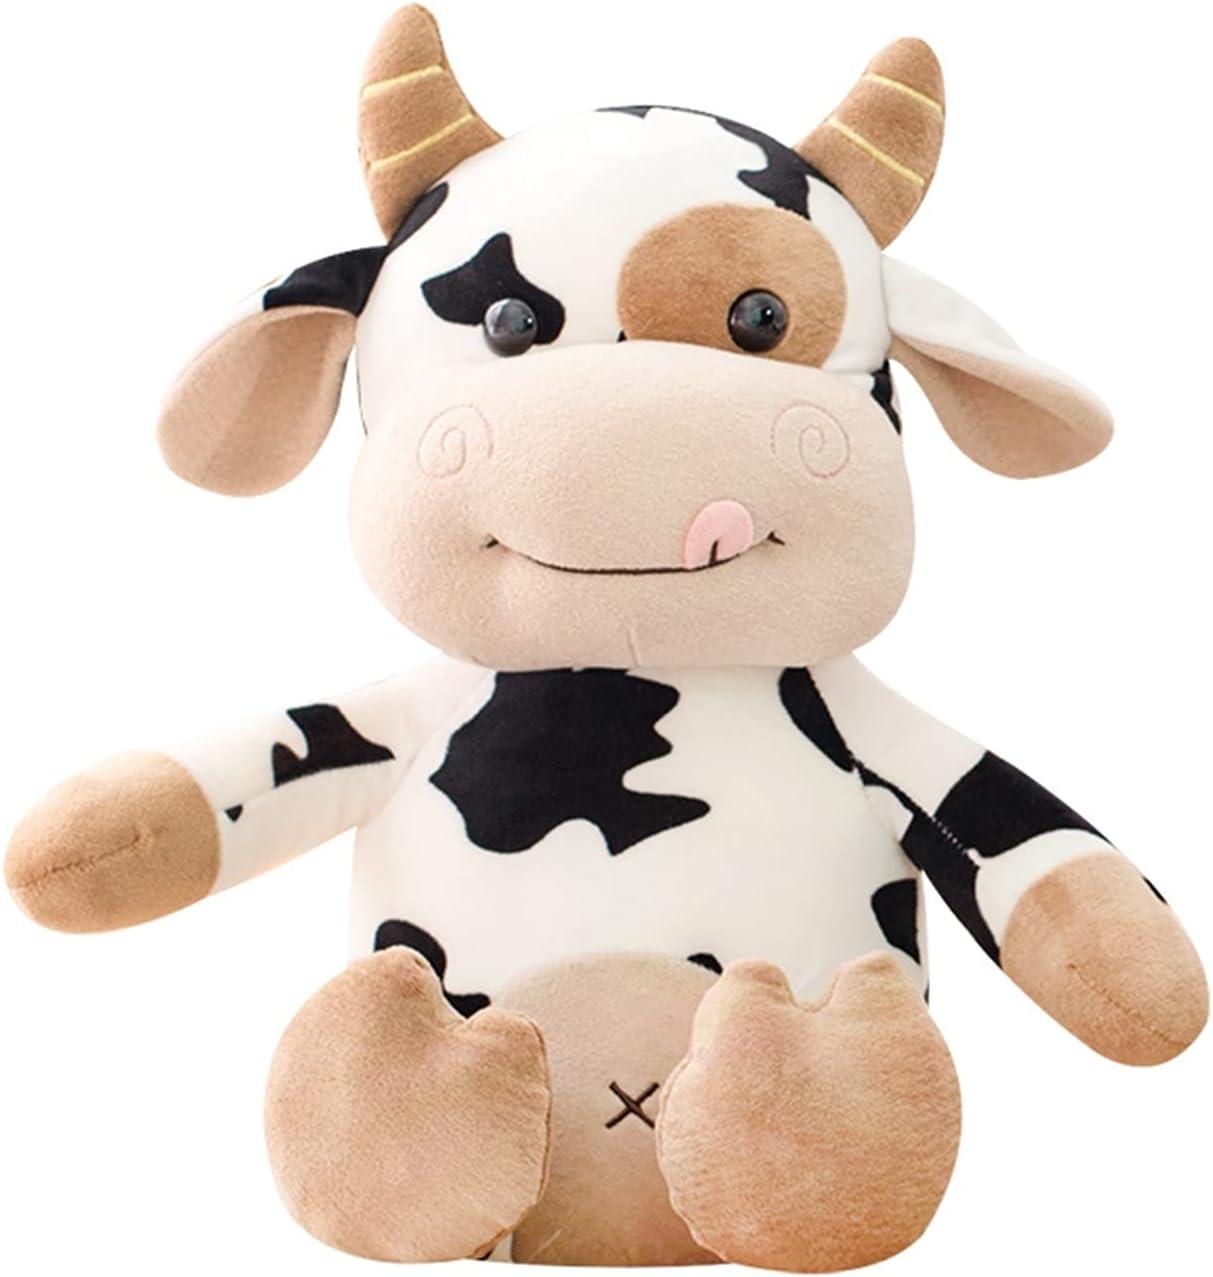 JJYGYTG Hugging Pillow Plush S Stuffed Cute Boston Mall Brand Cheap Sale Venue Animals